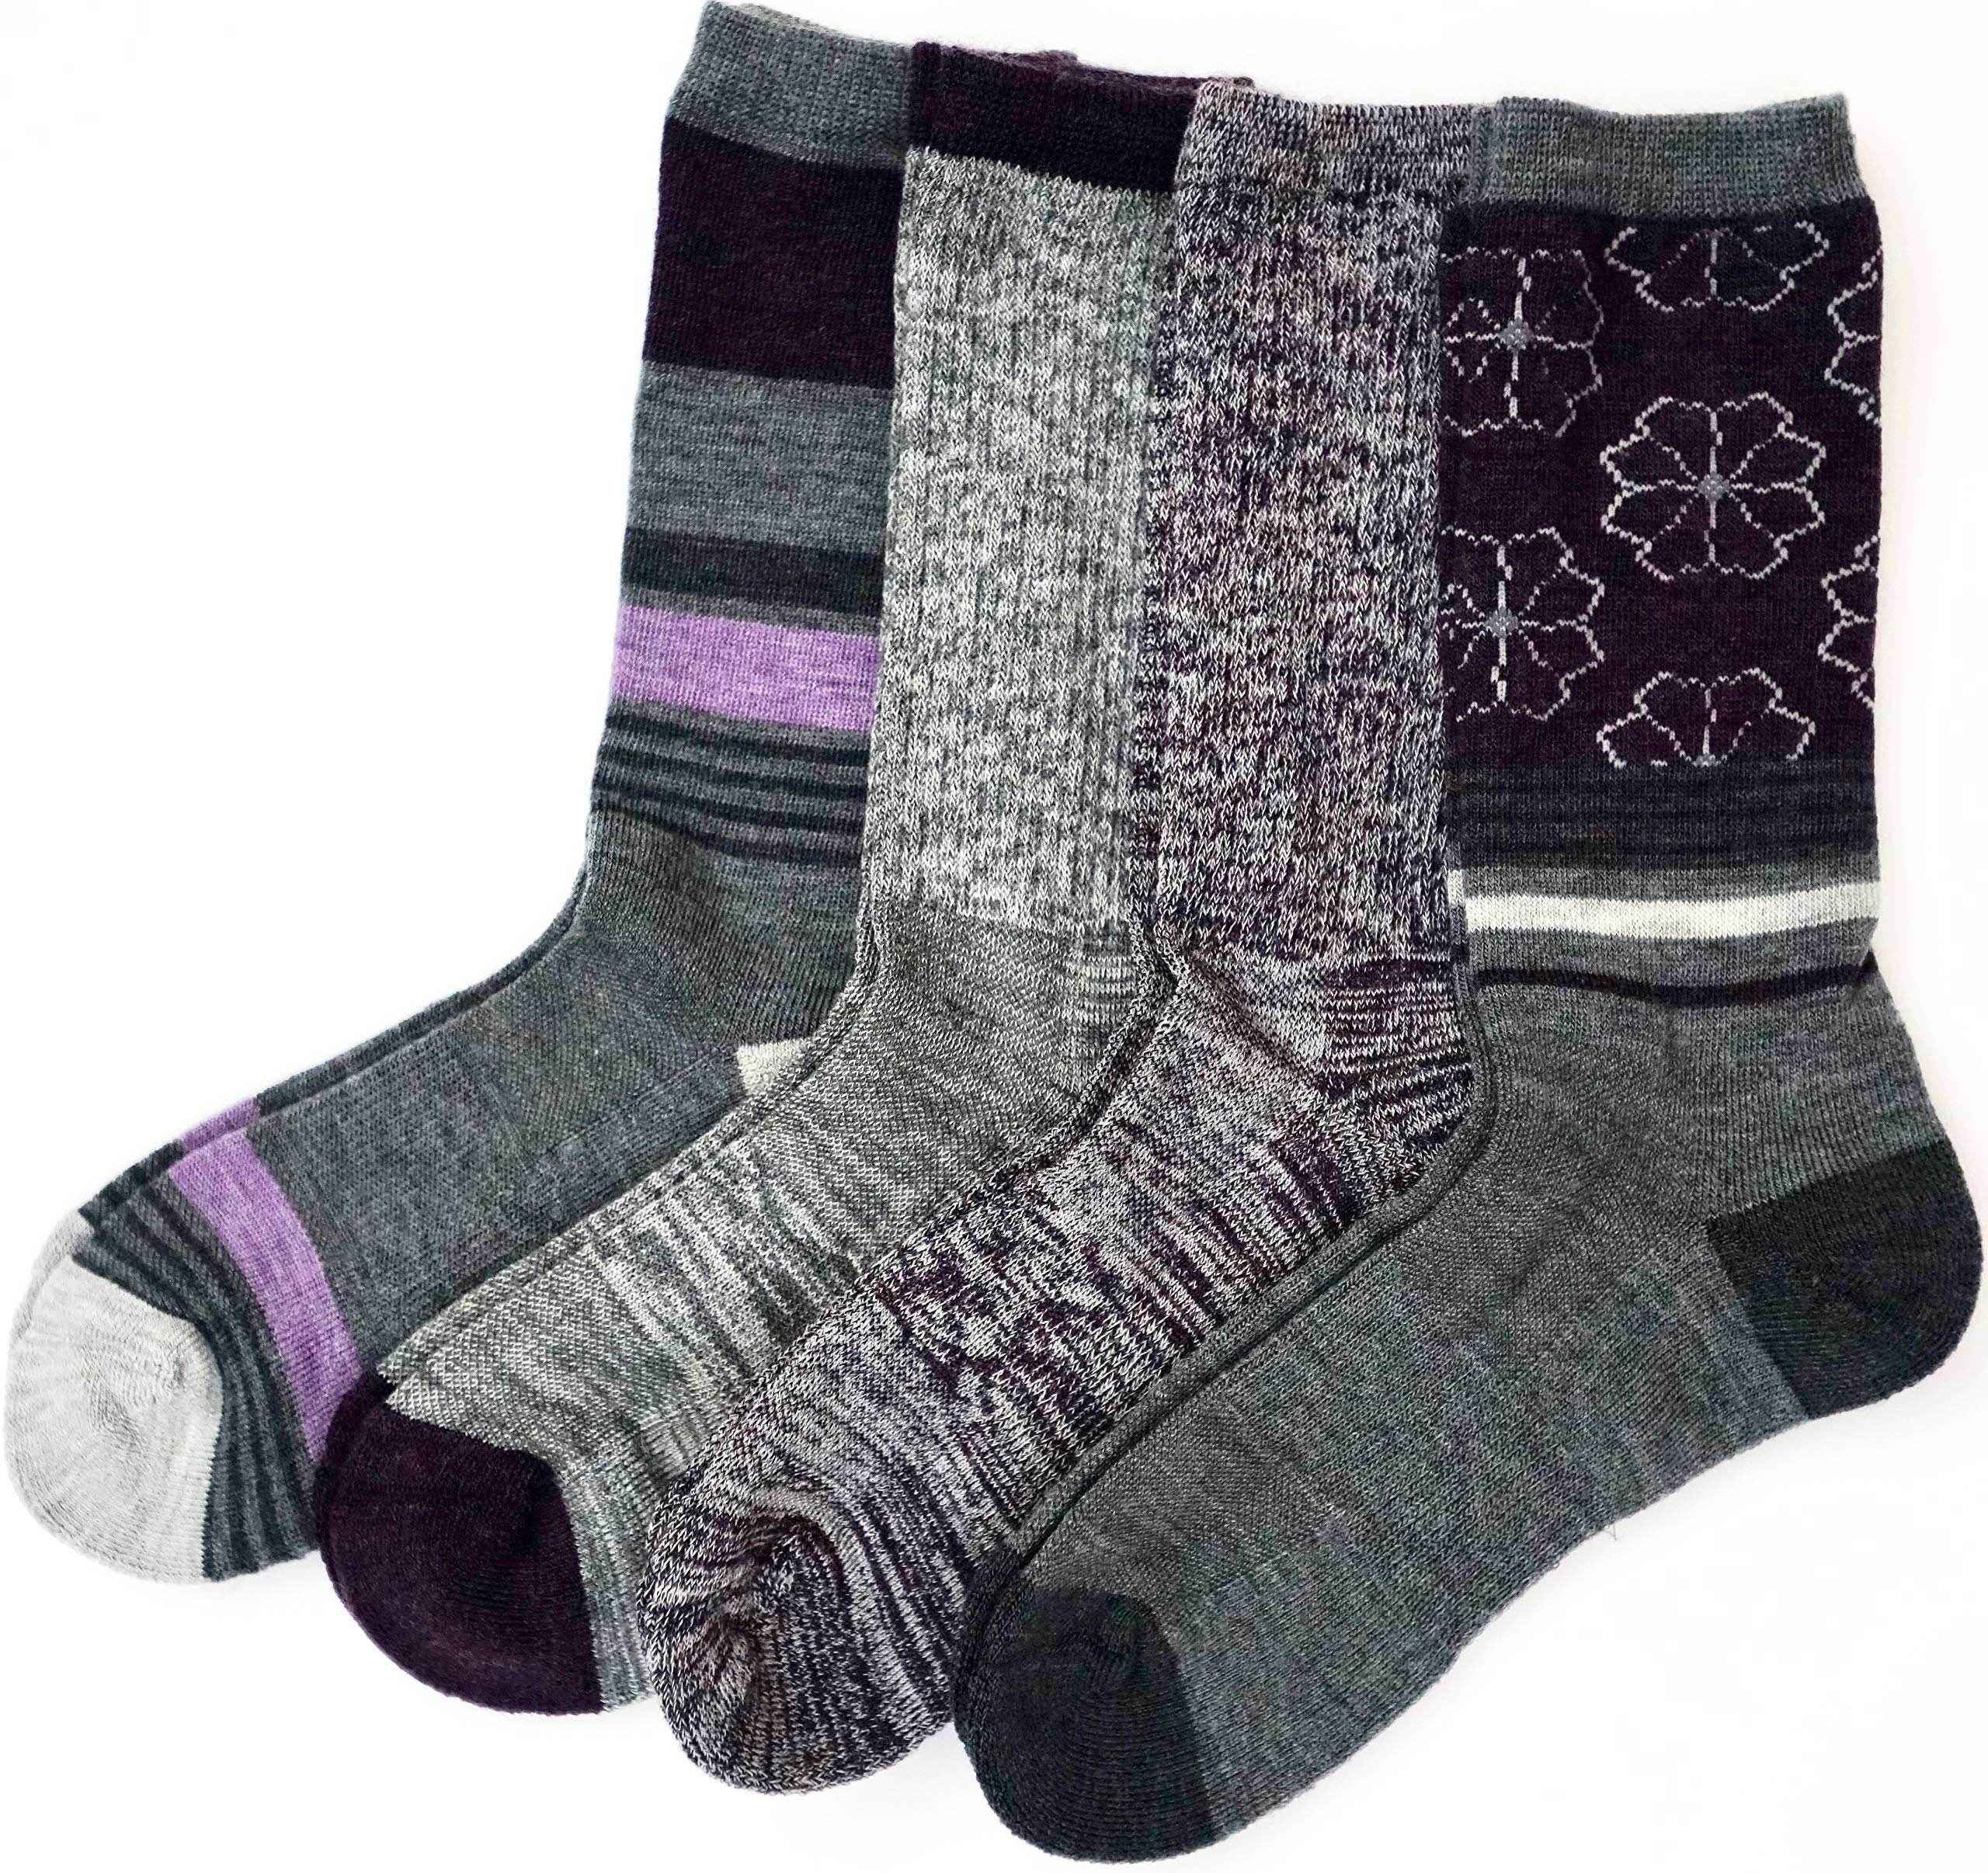 85f050400 Kirkland Signature Womens Trail Sock Pack of 4. Enerwear 4 Pack Women s Merino  Wool Outdoor Hiking Trail Crew Sock